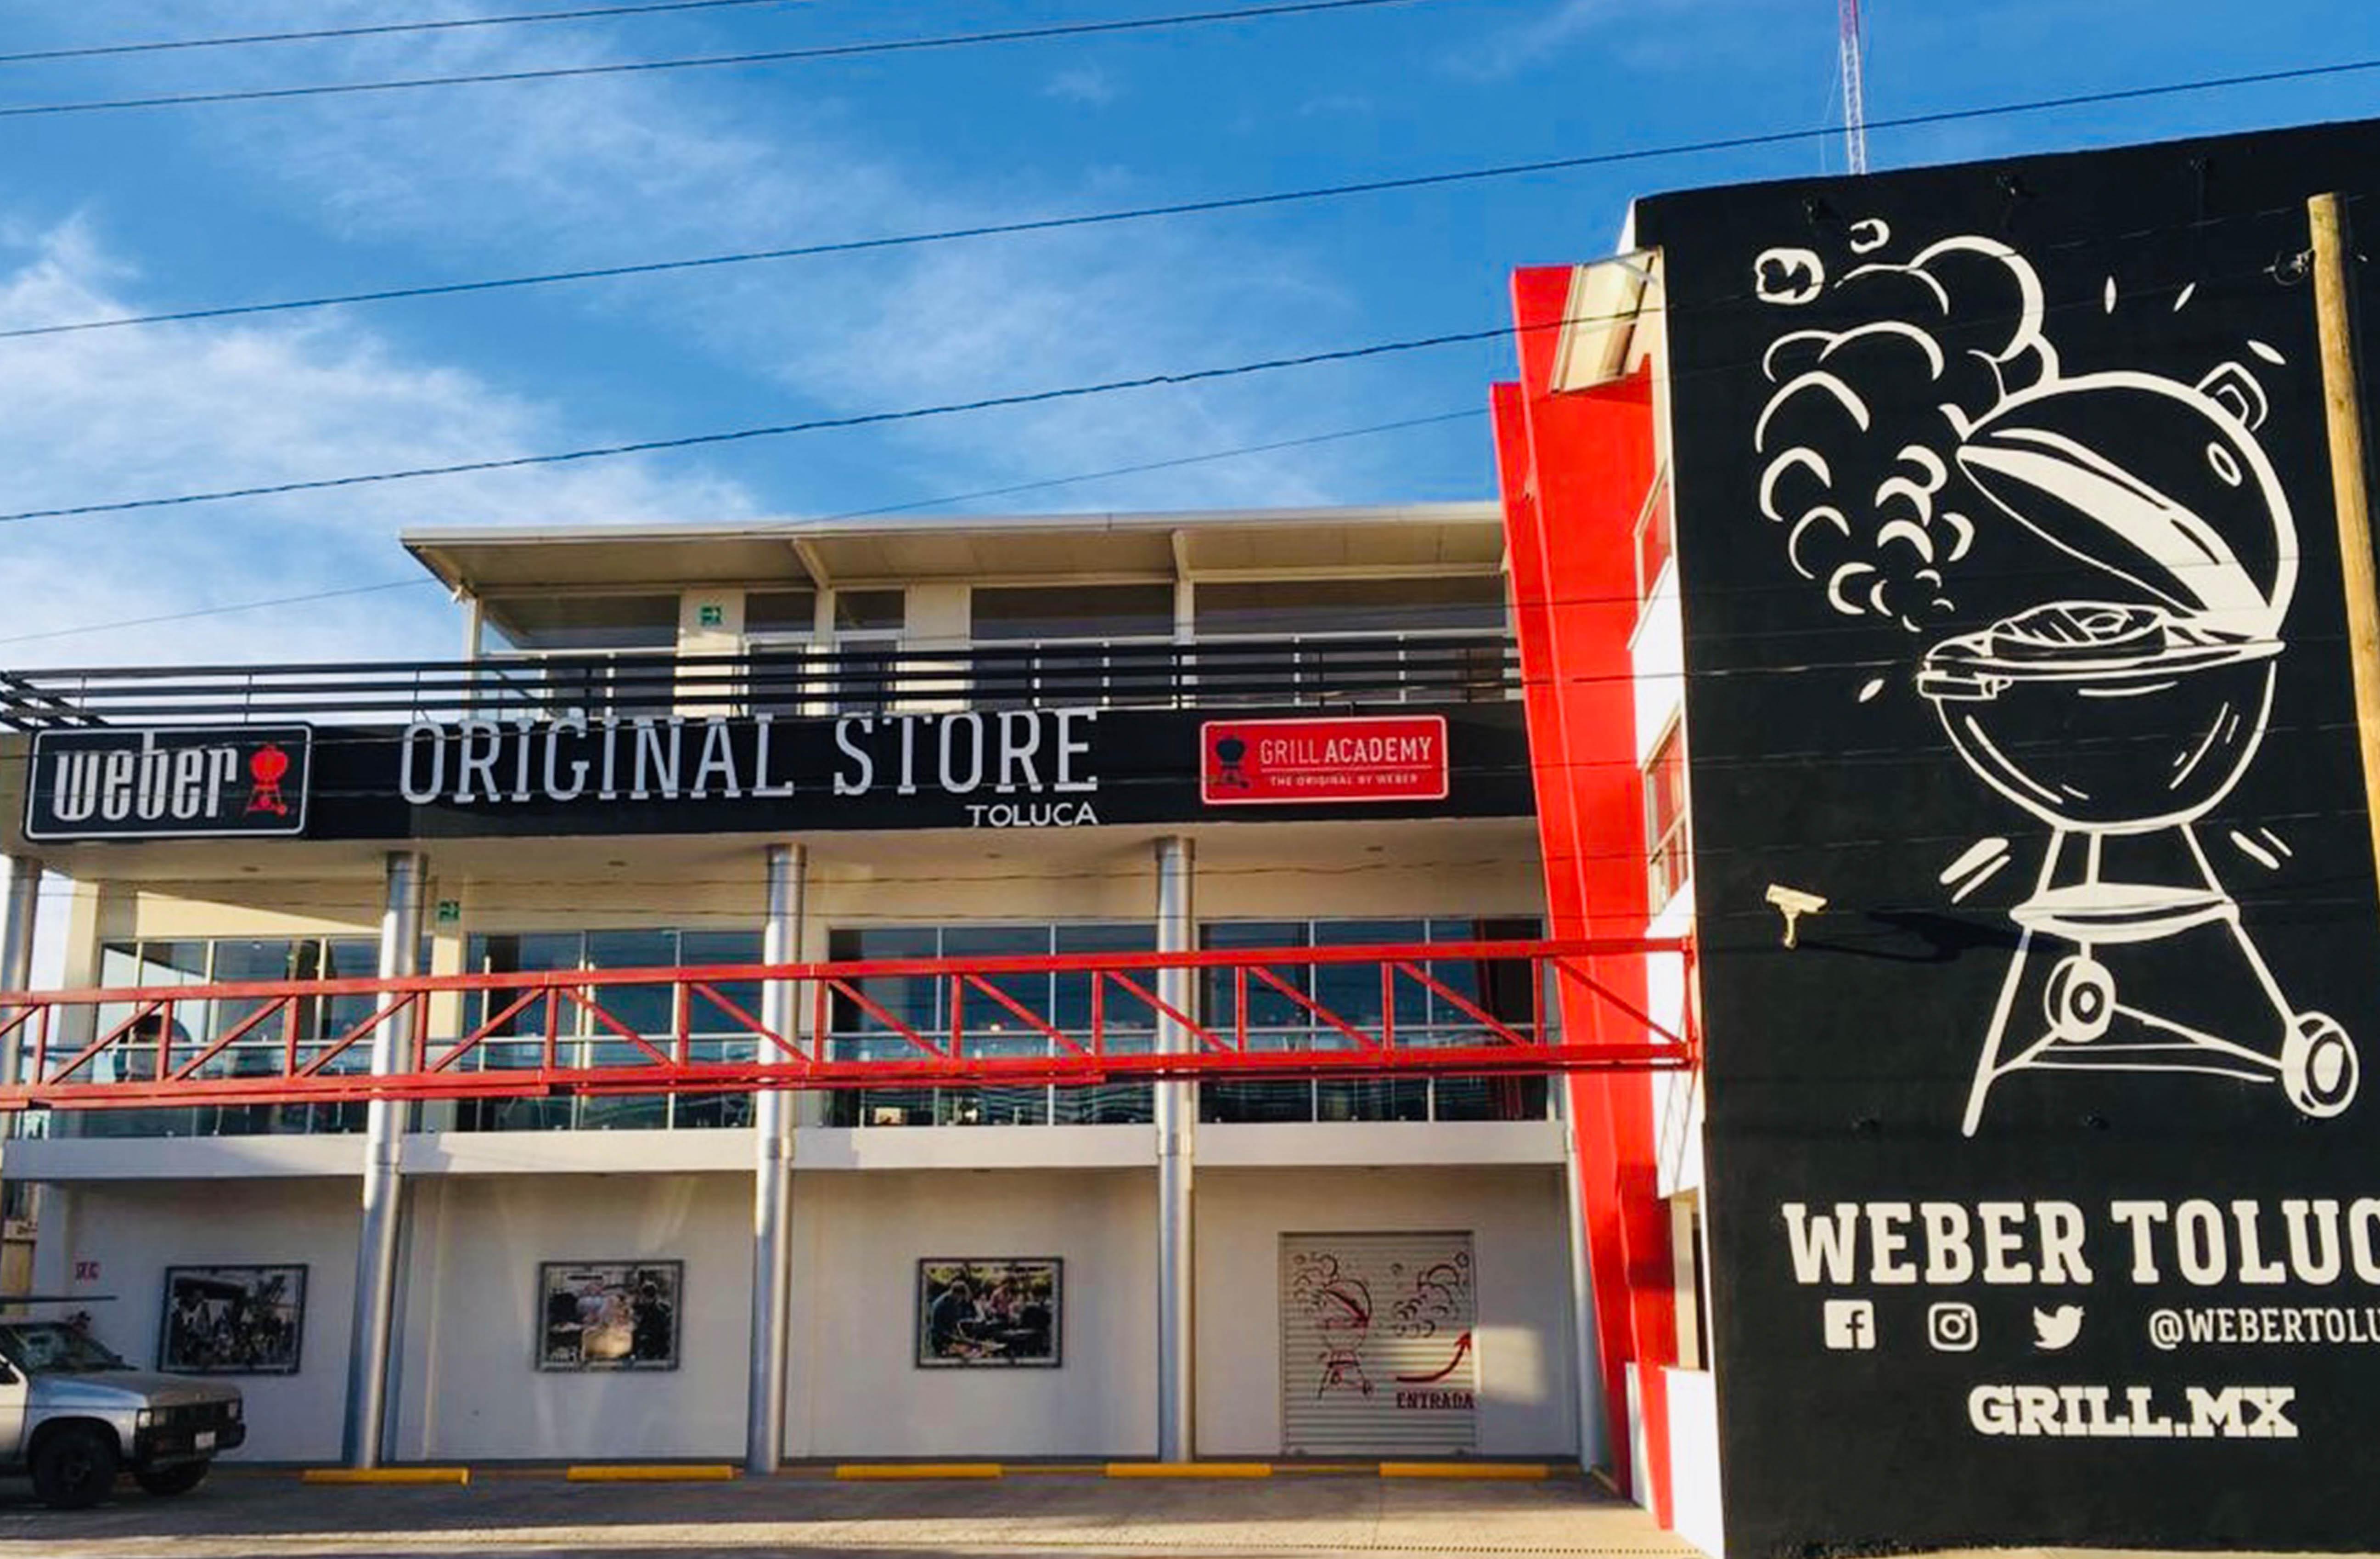 Weber Original Store Toluca